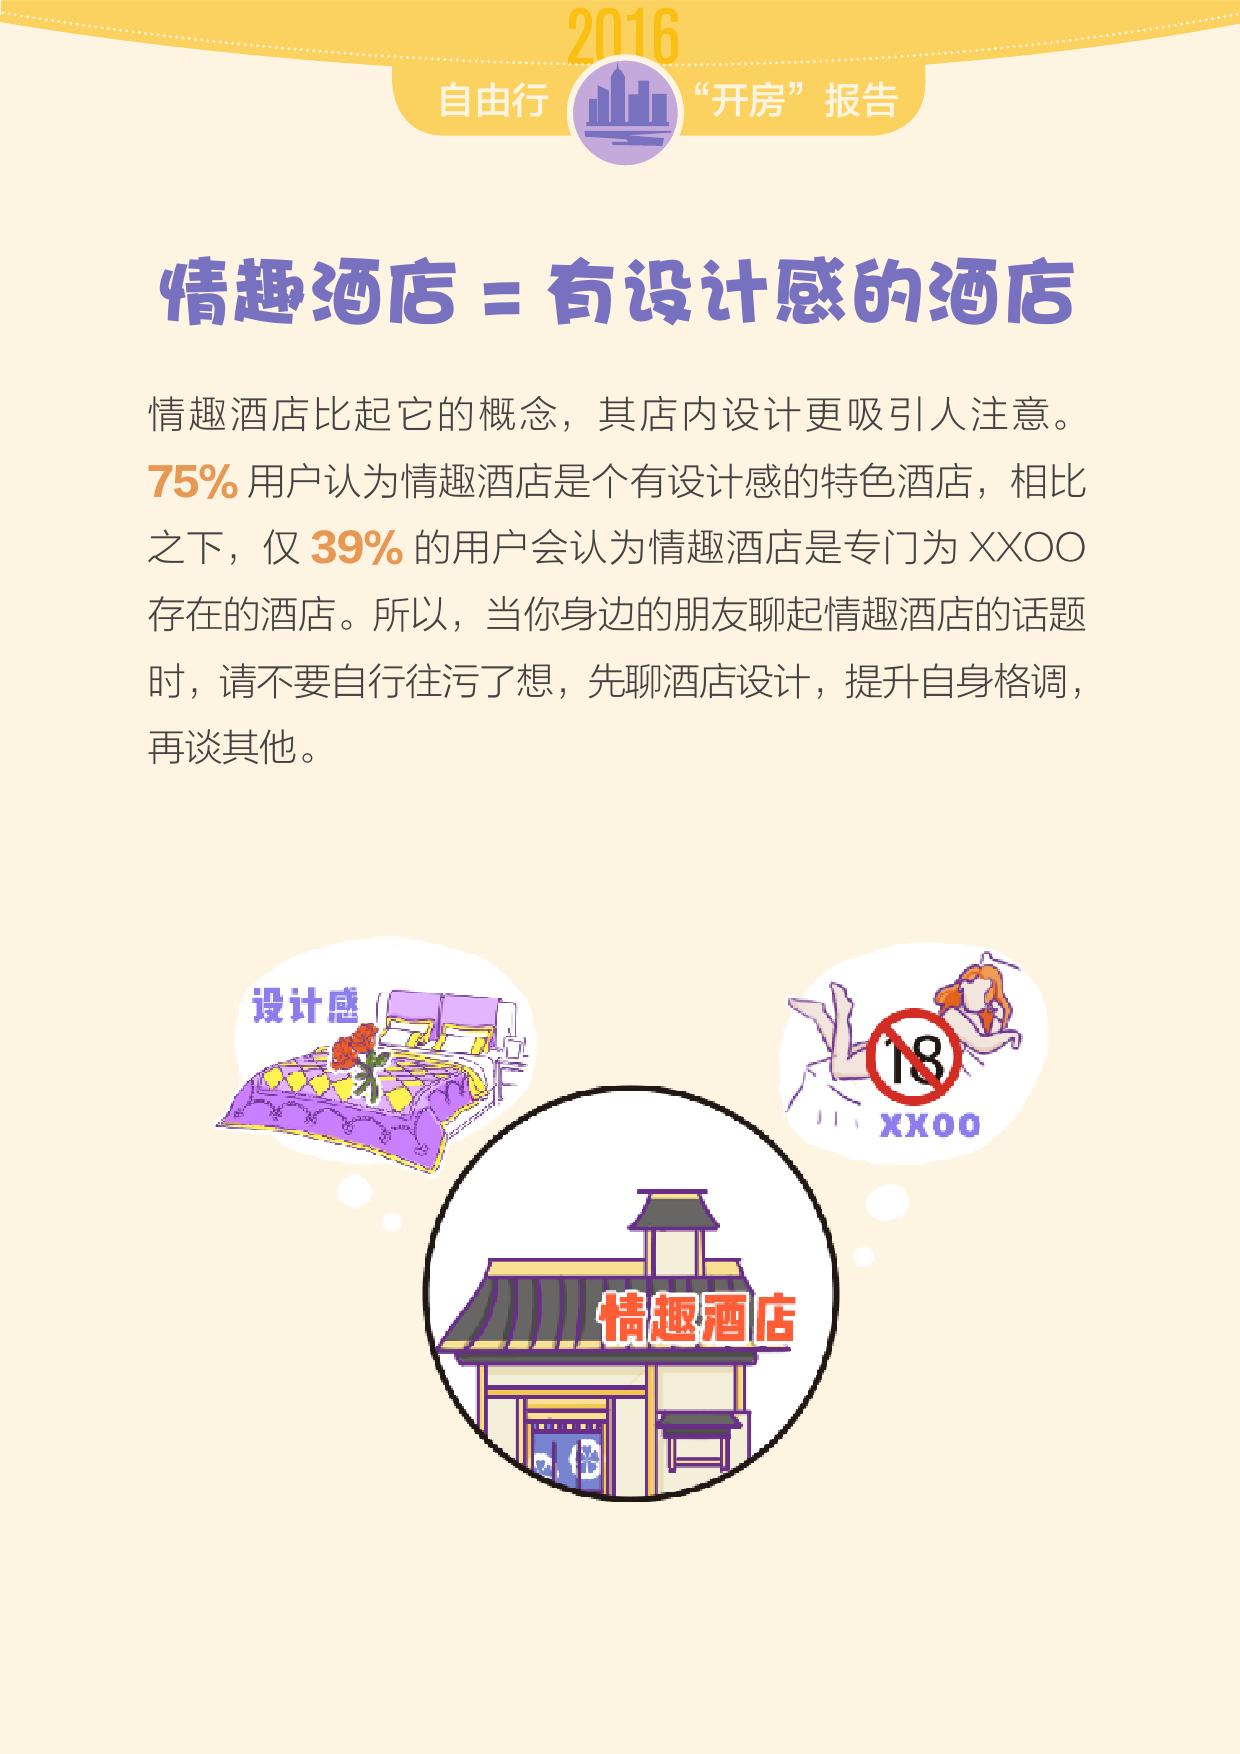 %e8%87%aa%e7%94%b1%e8%a1%8c%e5%bc%80%e6%88%bf%e6%8a%a5%e5%91%8a2016_000026